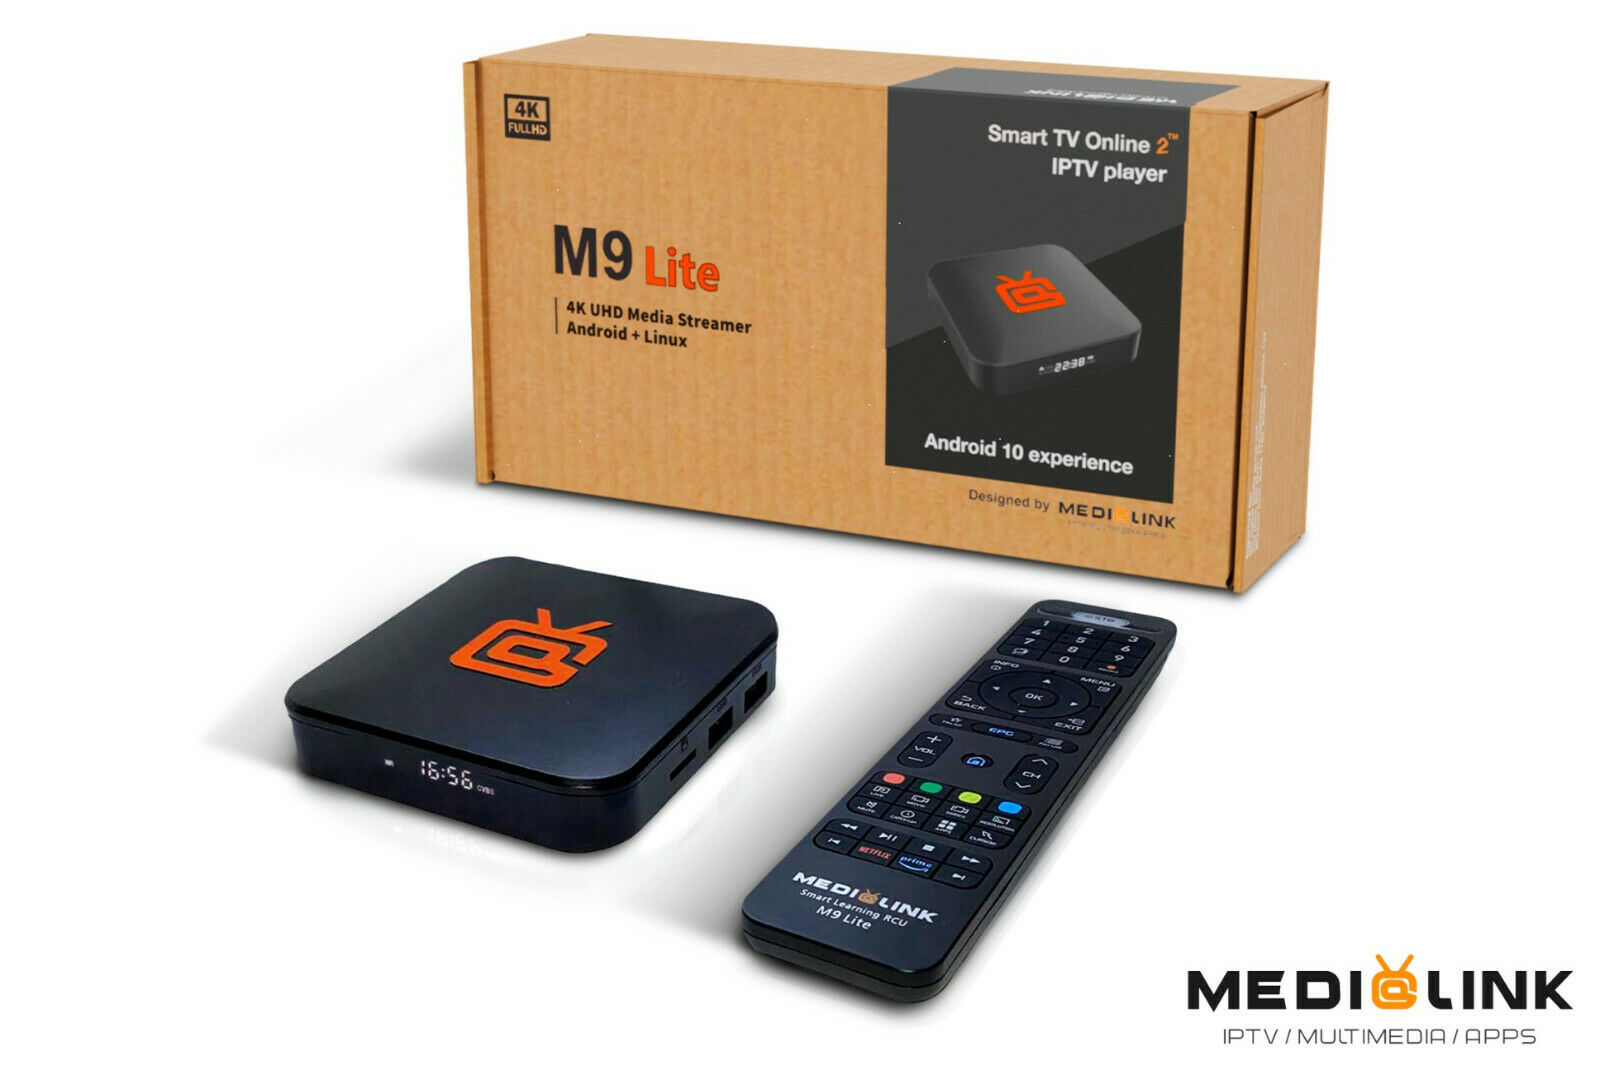 Medialink M9 Lite 4K UHD IP-Receiver (Android 10.0 + Linux, H.265, 60fps, HDMI, USB, LAN, MicroSD)